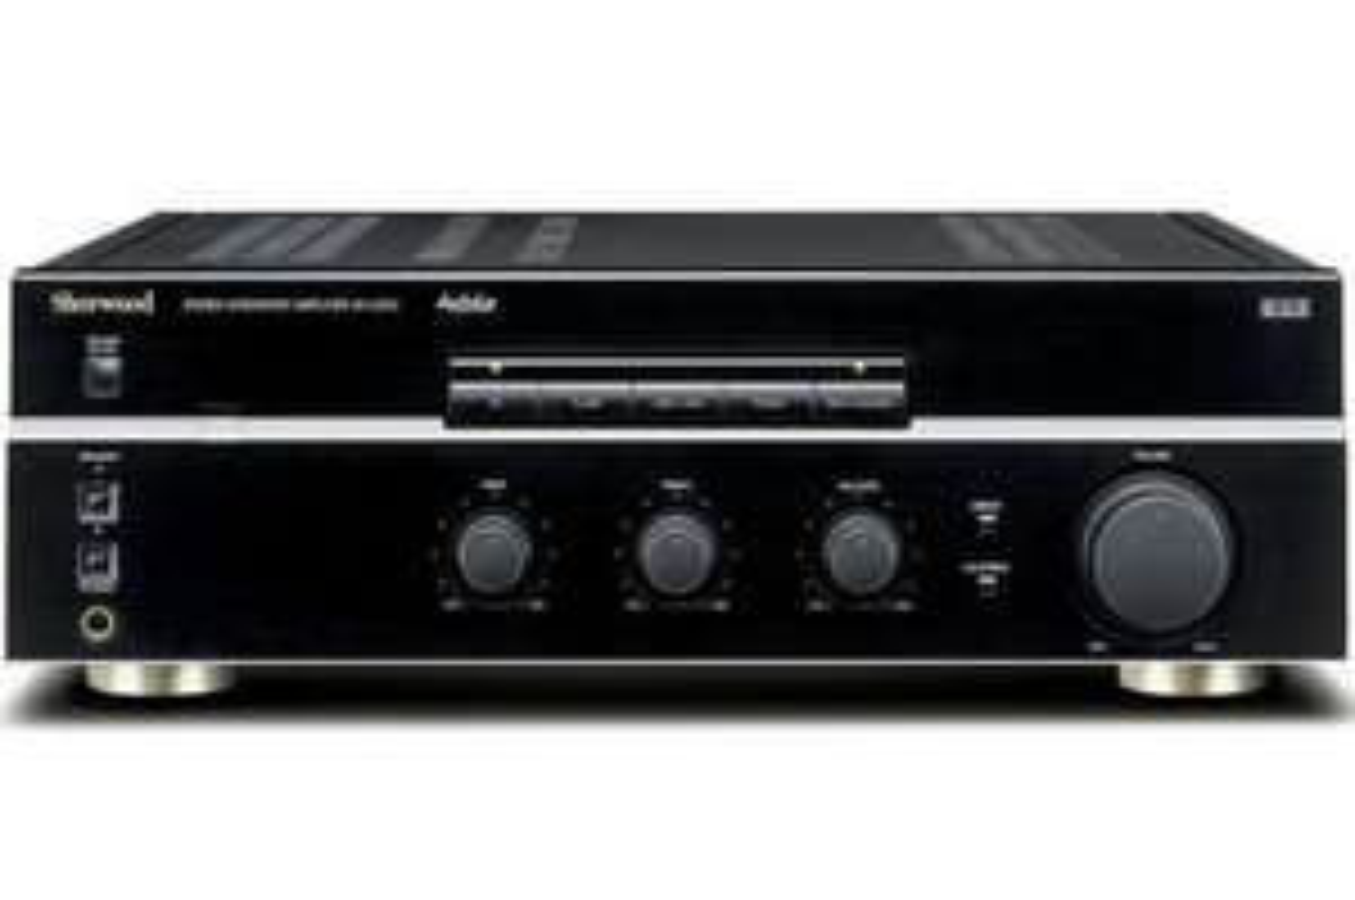 Ampli HI-FI Sherwood AX-5505